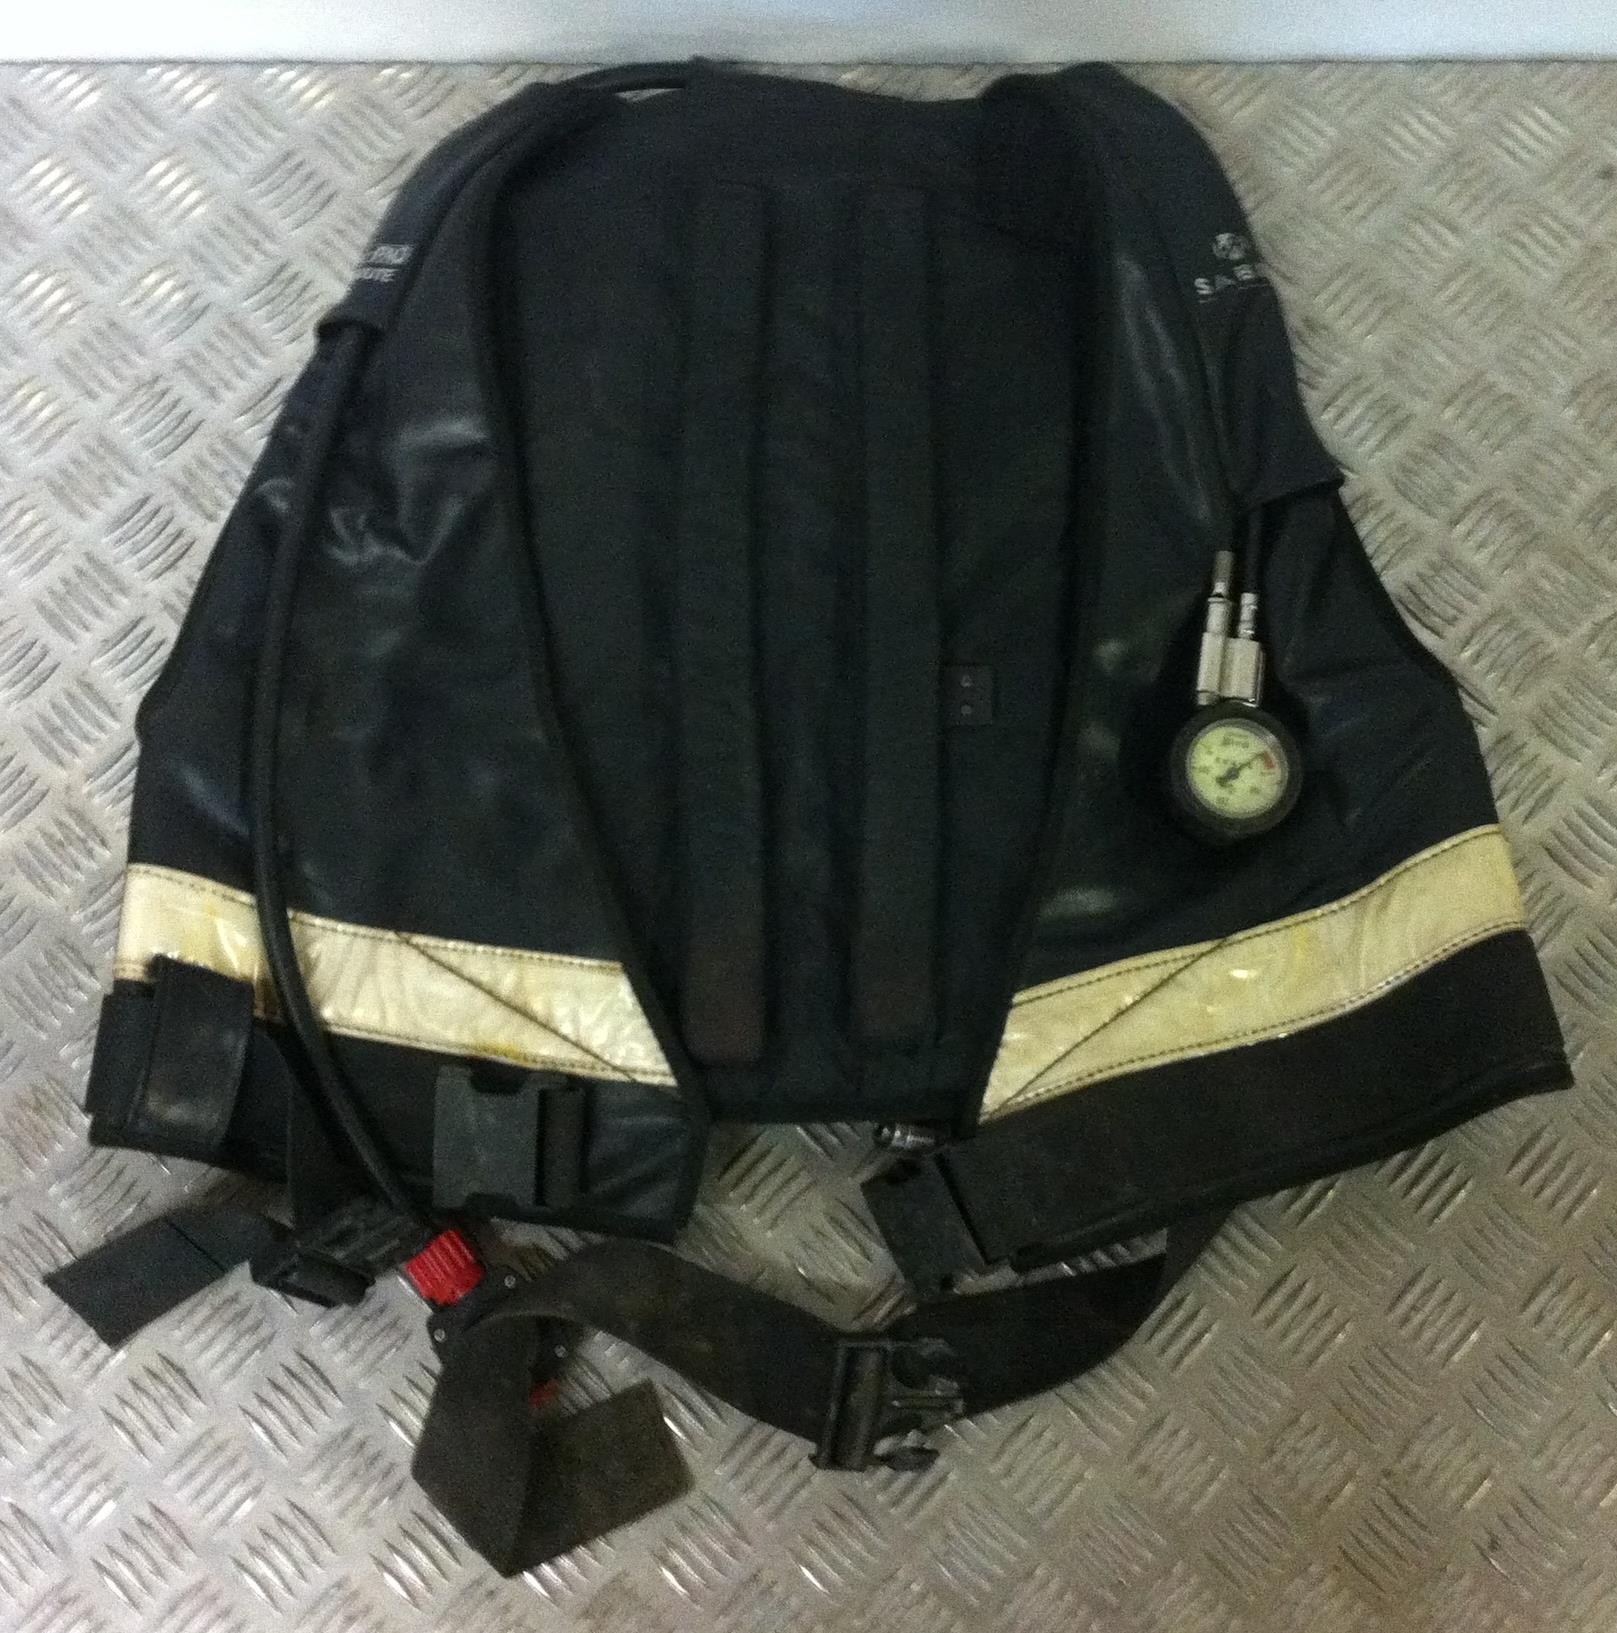 Lot 14 - Sabre Cenpaq Jacket Breathing Set